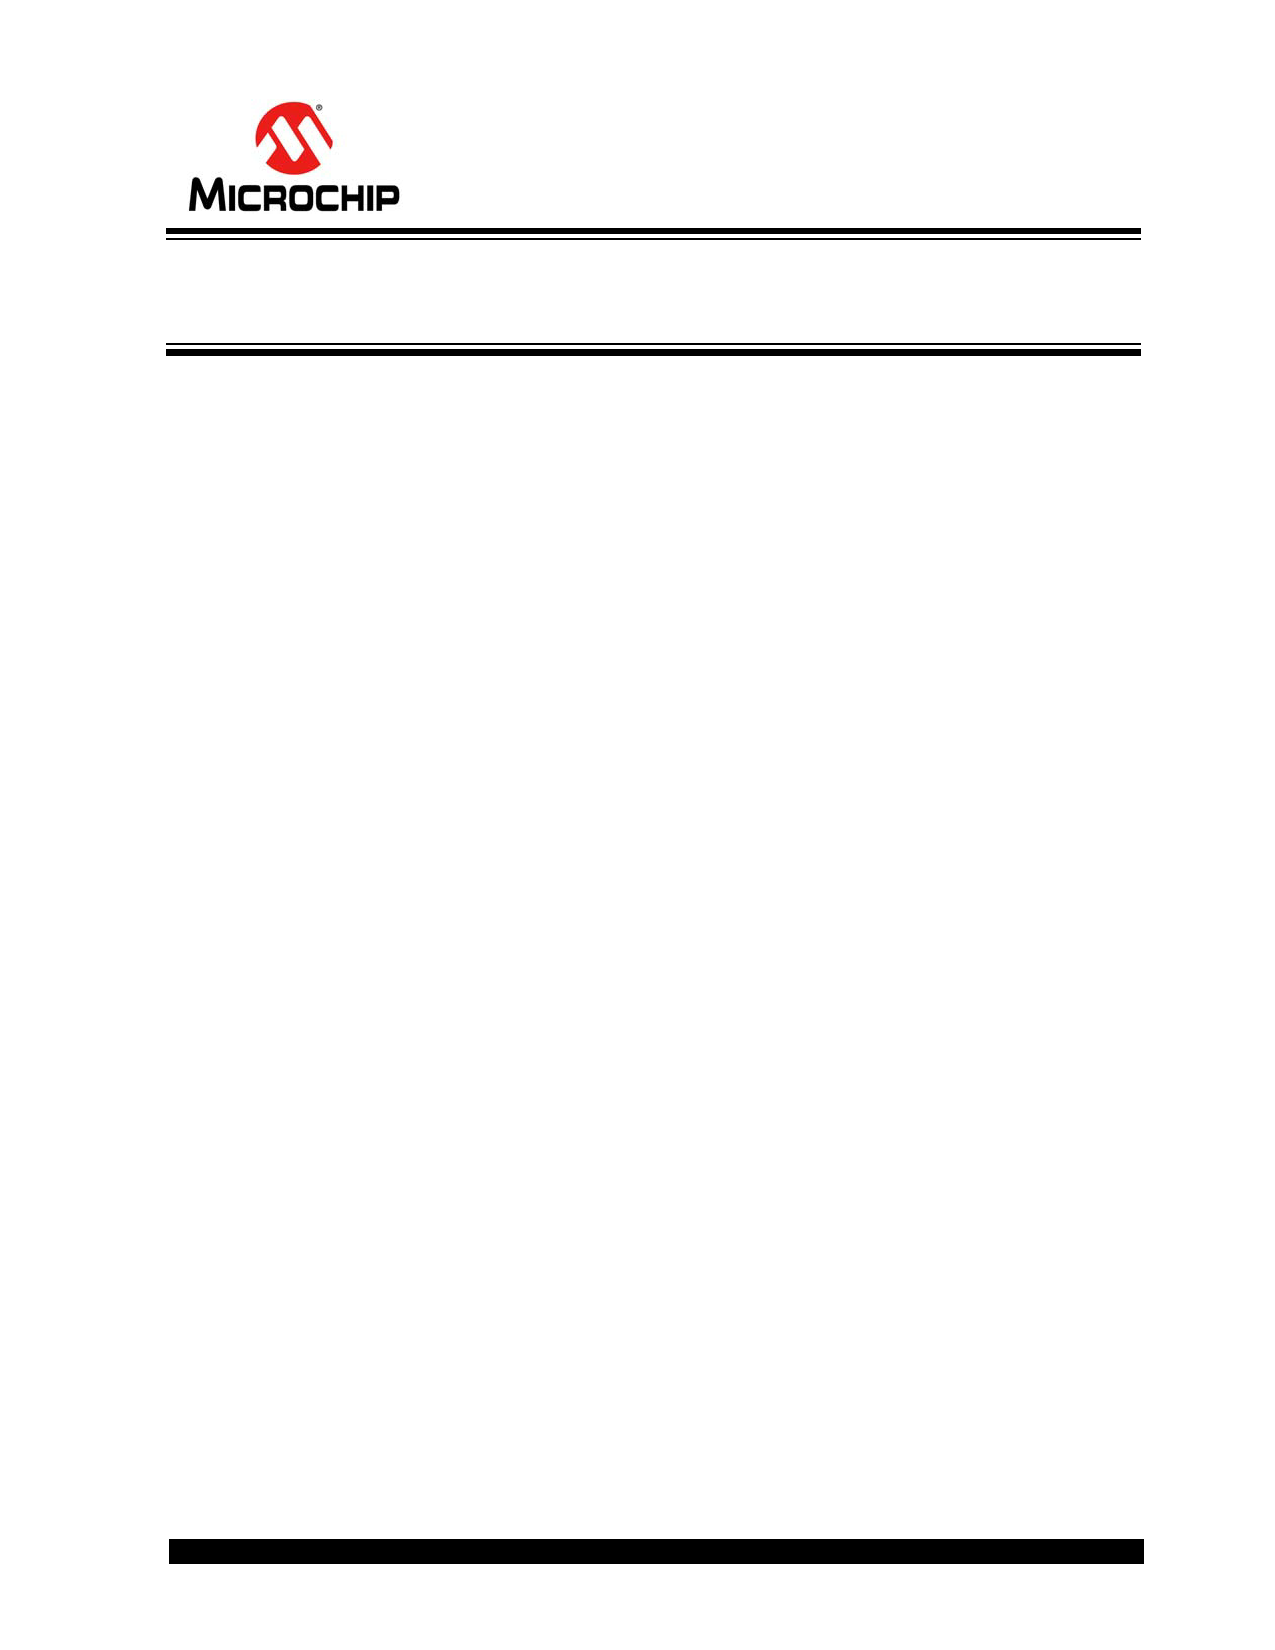 PIC24FV16KA304 데이터시트 및 PIC24FV16KA304 PDF